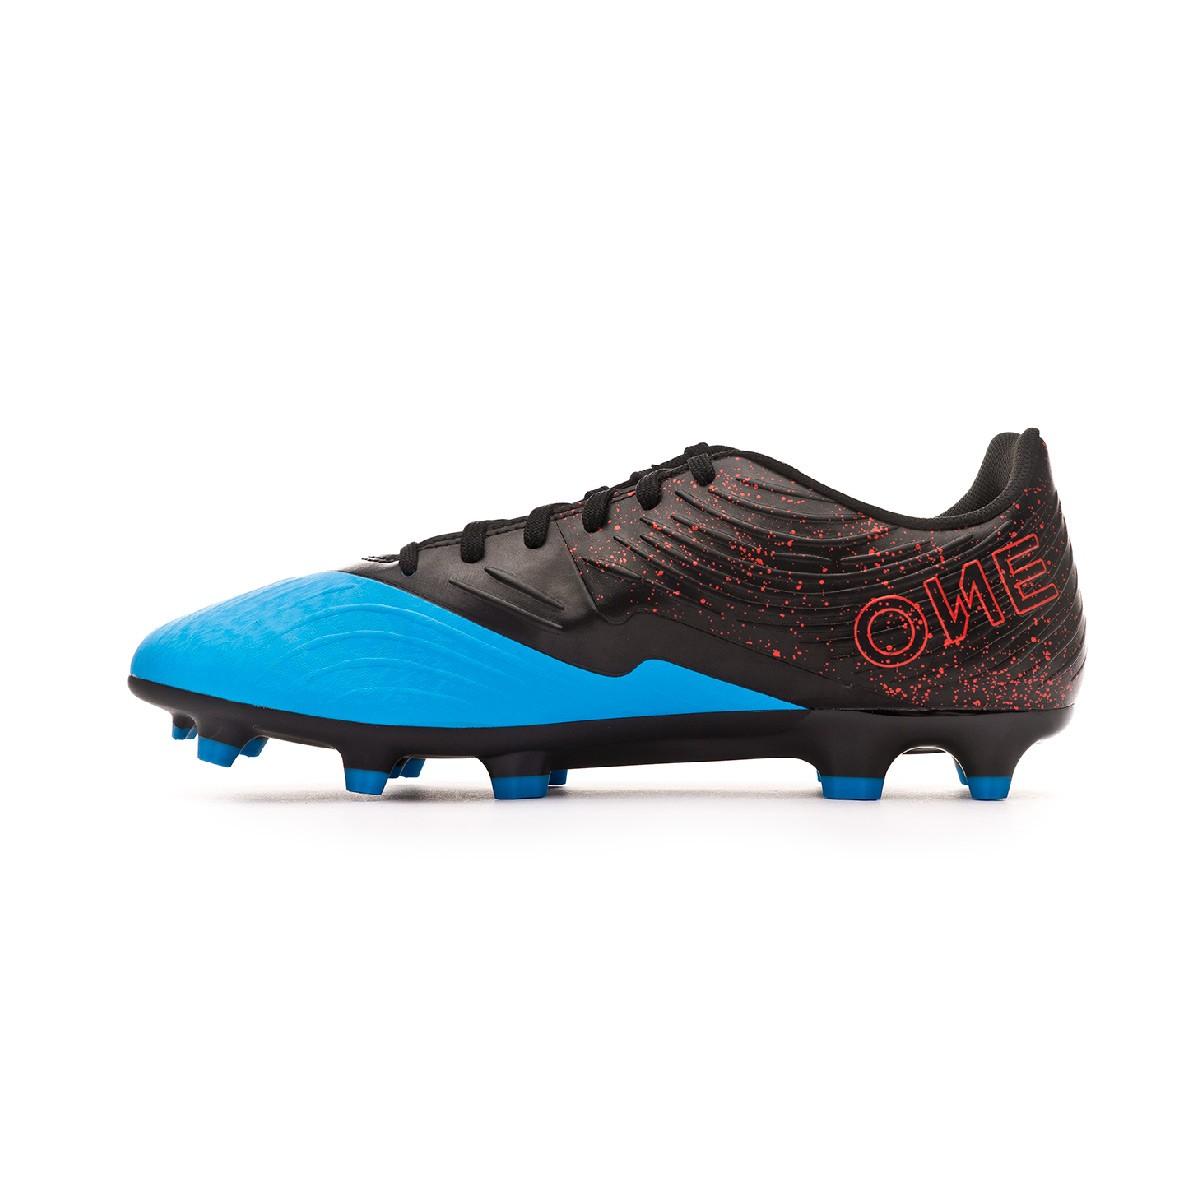 PUMA Future 18.4 FGAG, Chaussures de Football Mixte Enfant